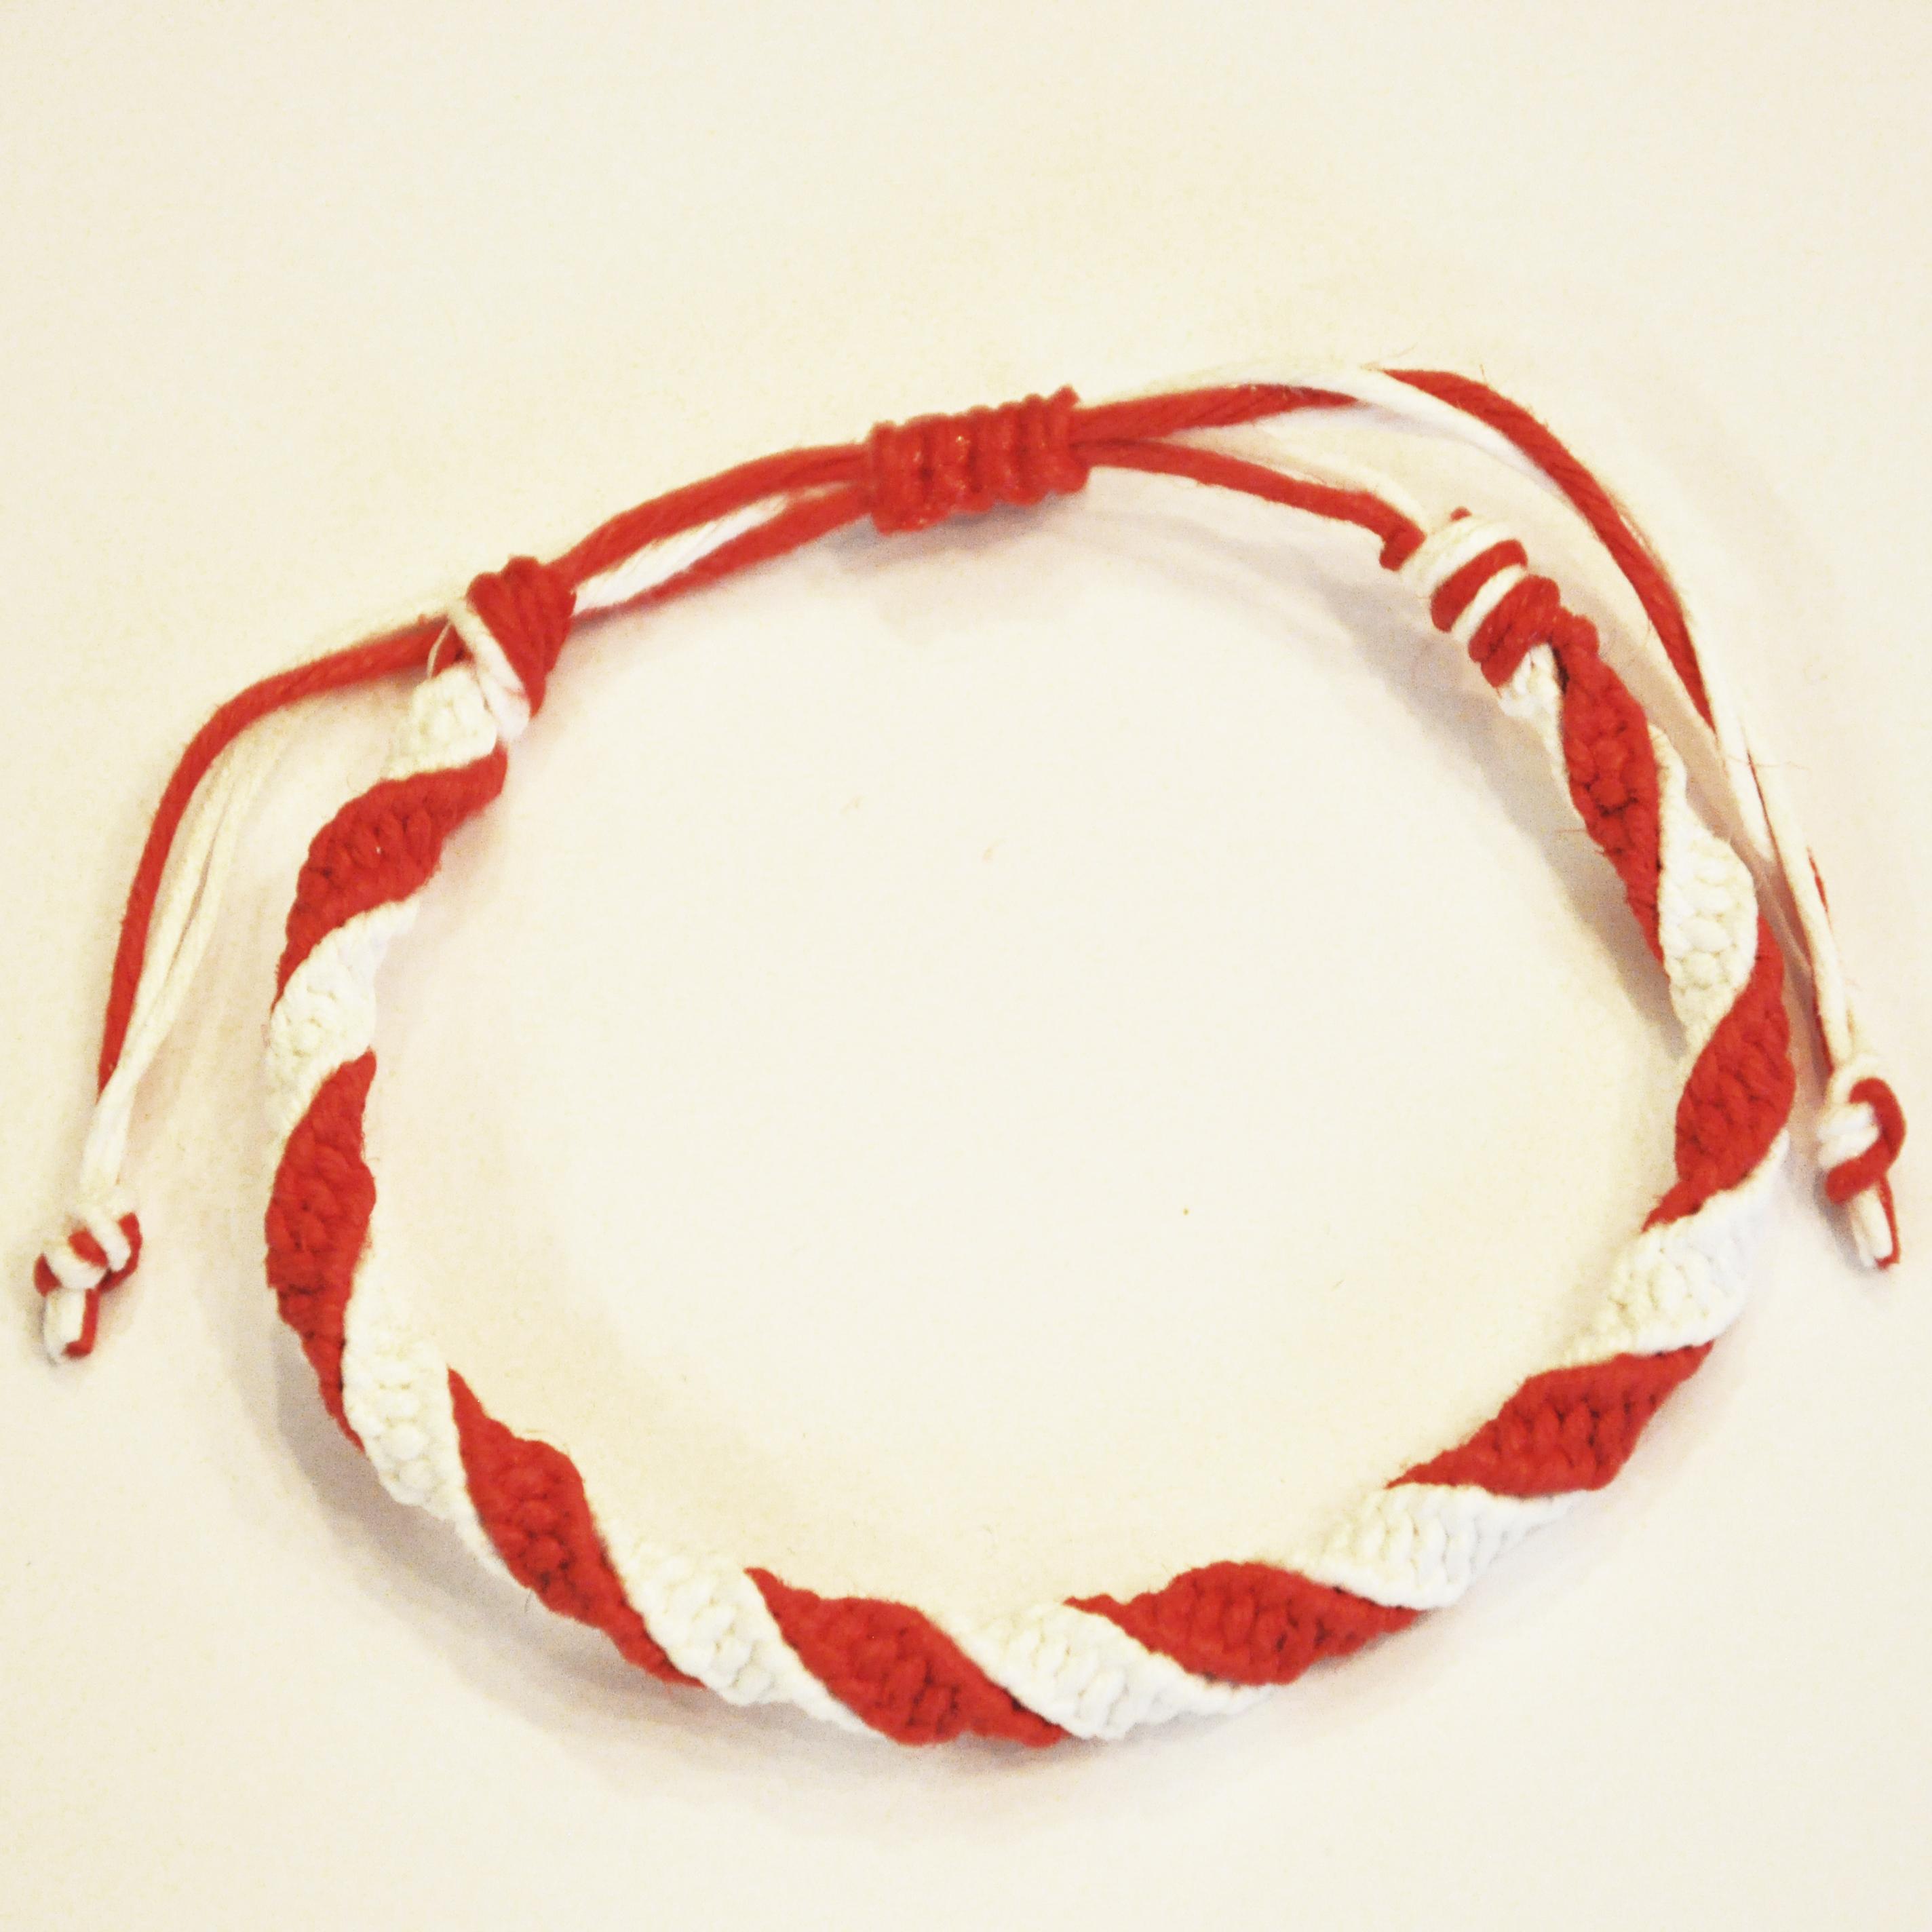 Human Bracelet